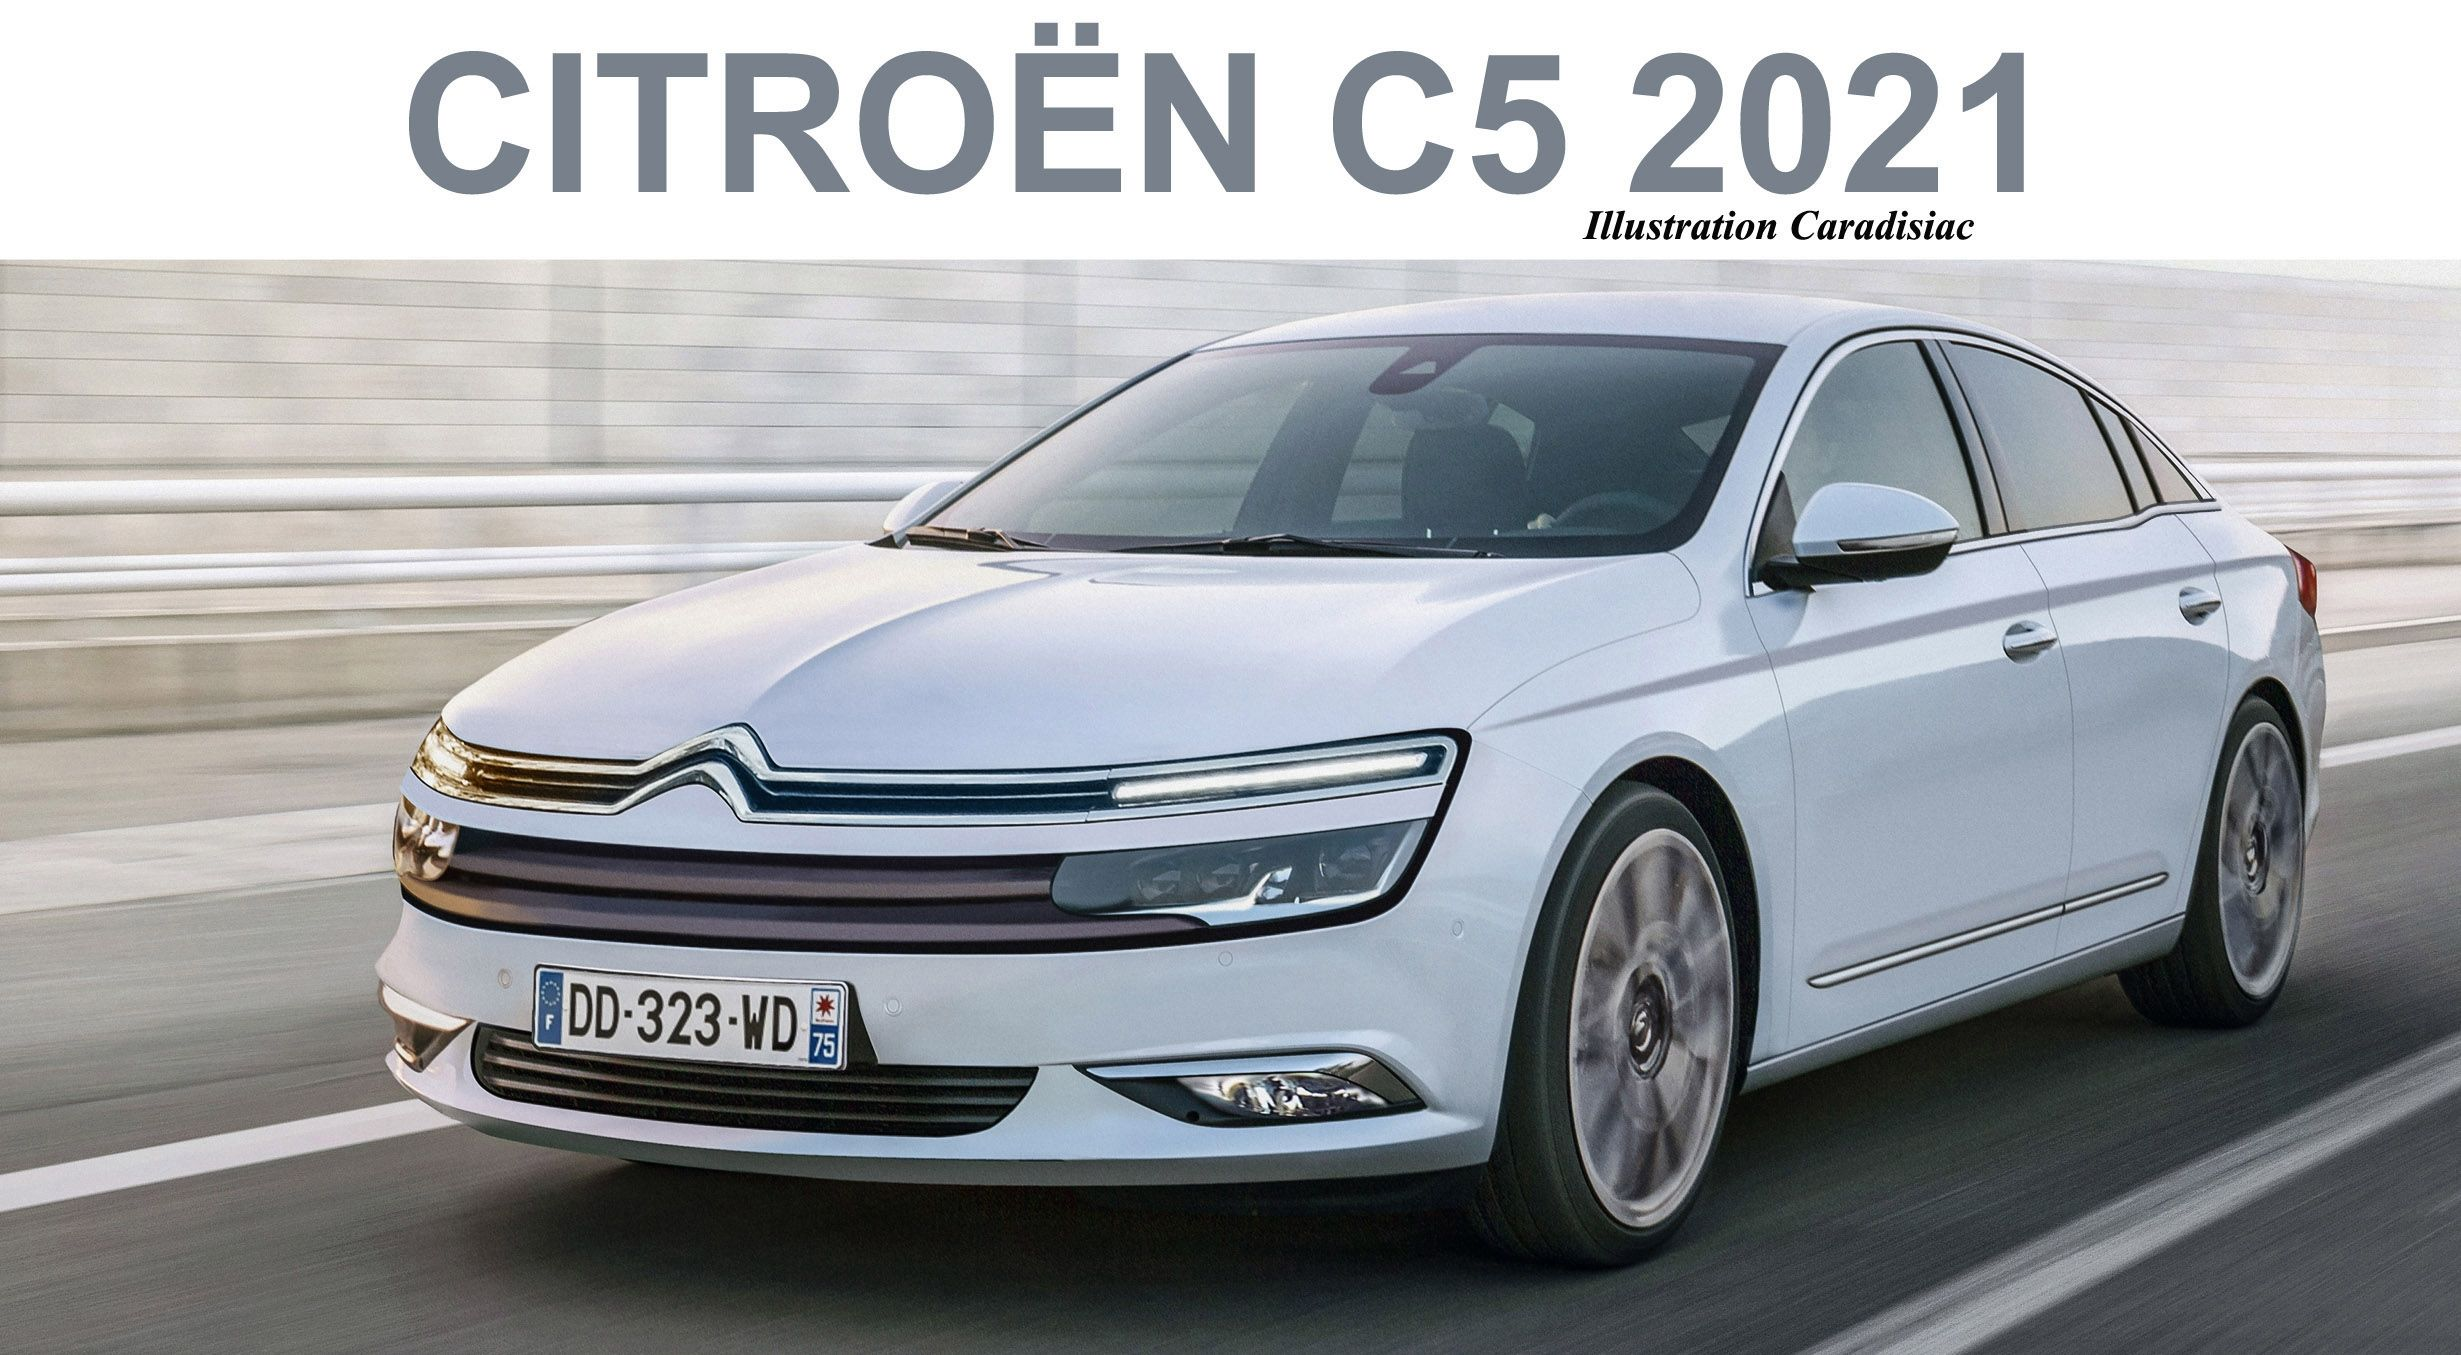 2021 Citroen C5 Picture